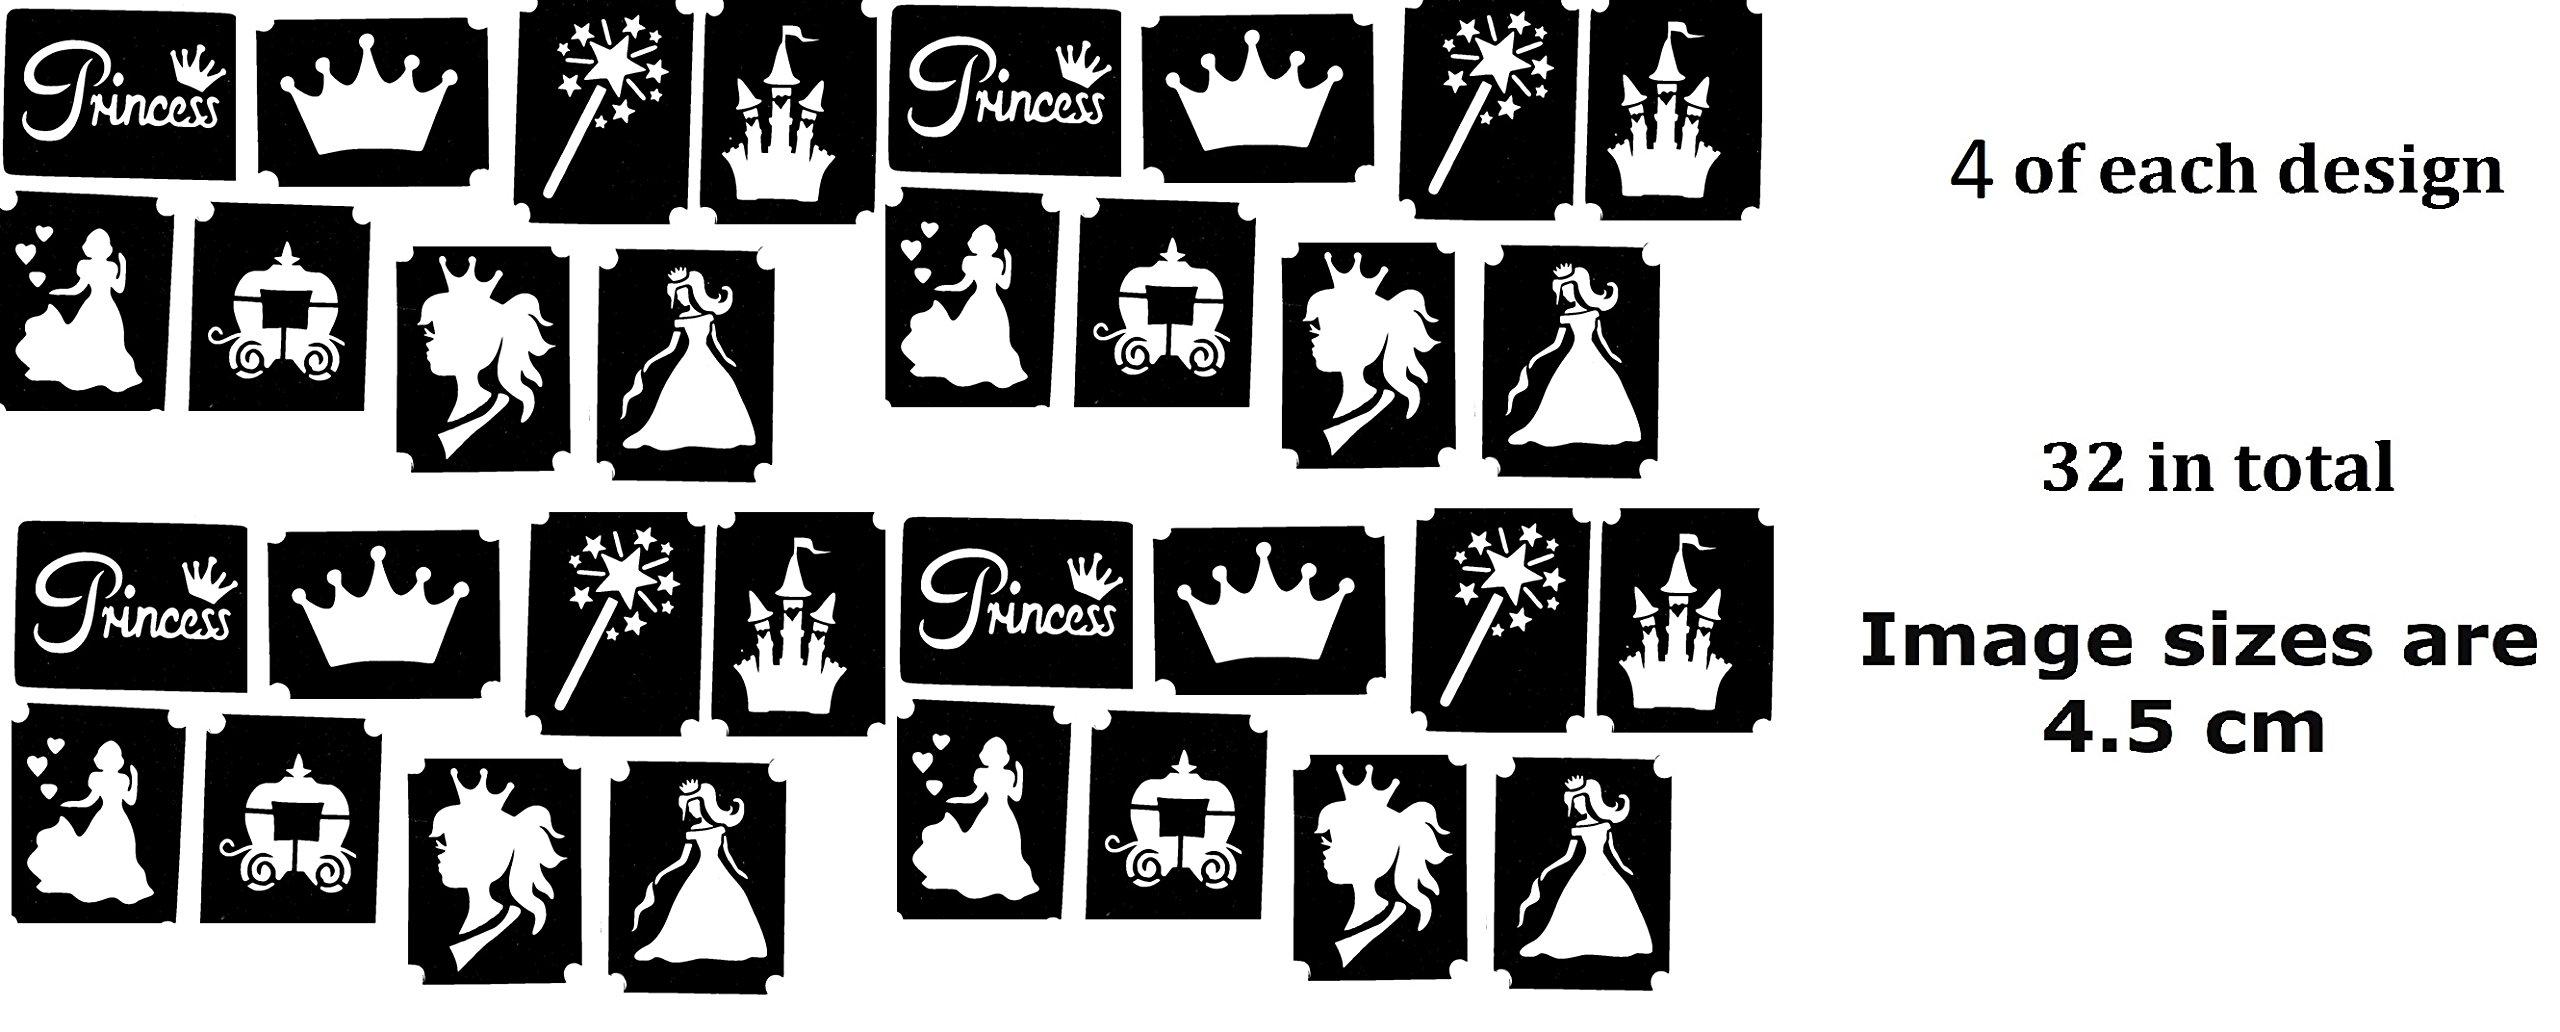 Princess Tattoo Stencil Collections (32 Tattoo Glitter Airbrush Stencil Princess)